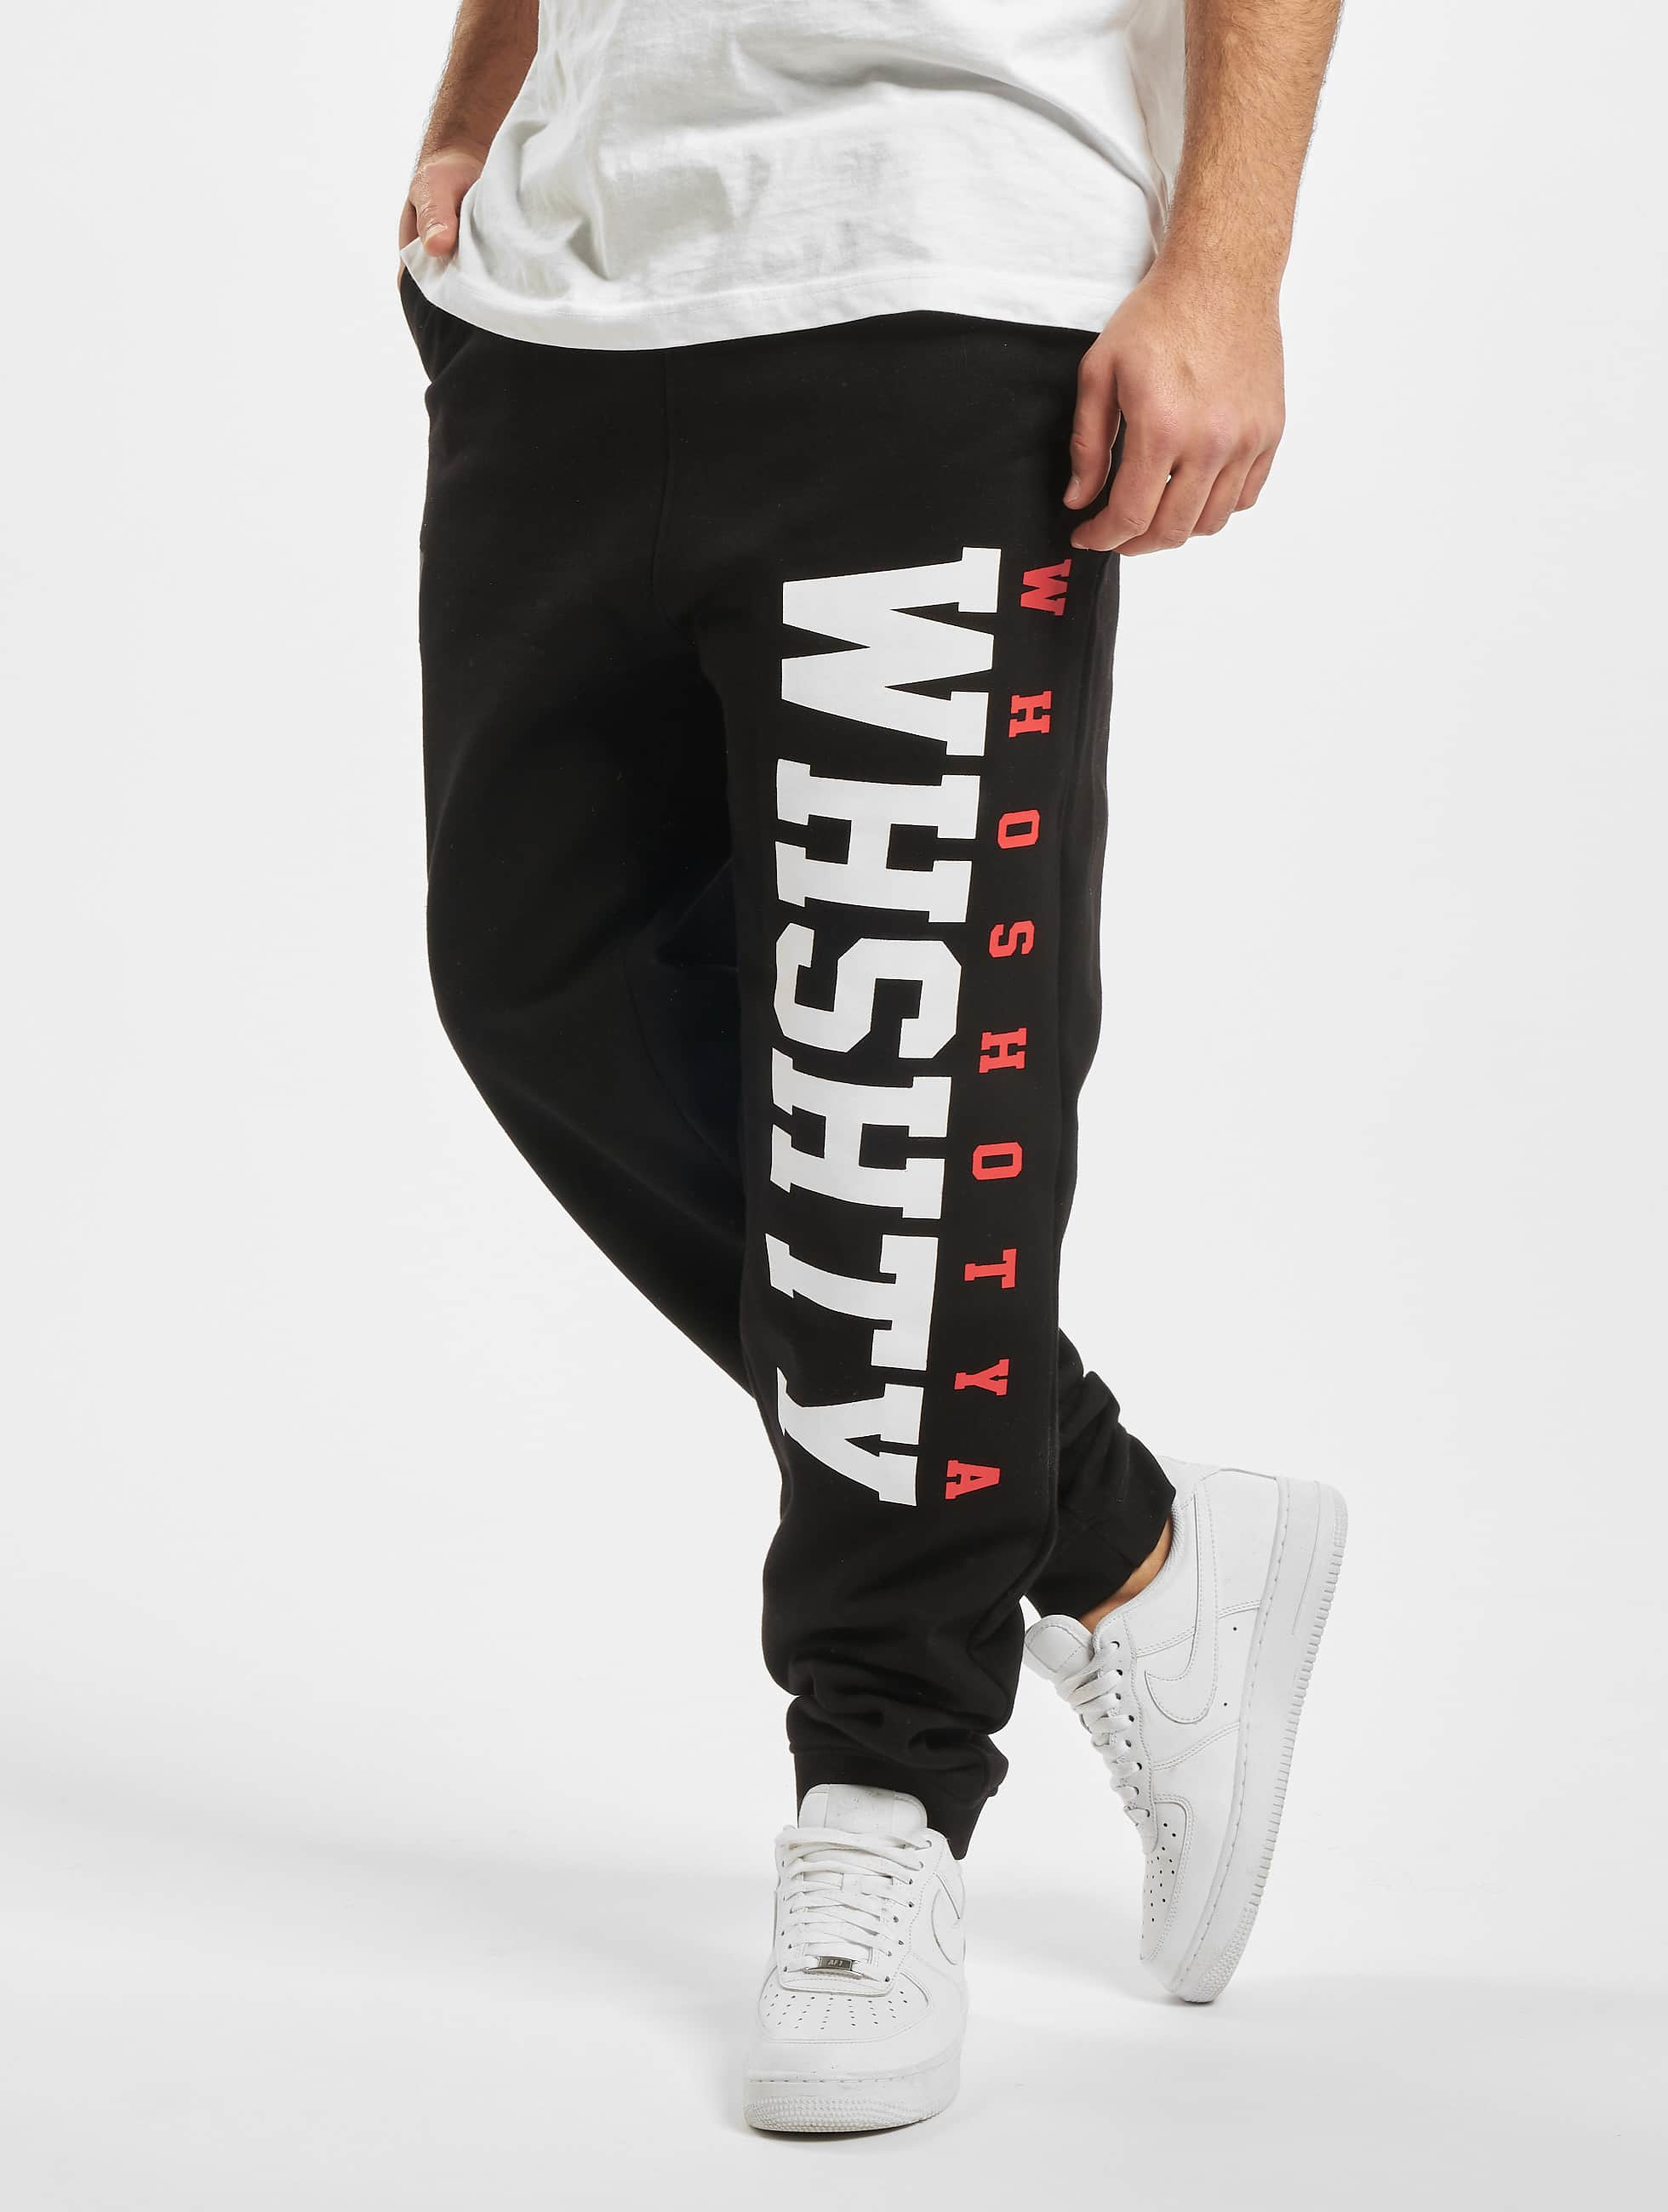 Who Shot Ya? / Sweat Pant WHSHTY in black XL